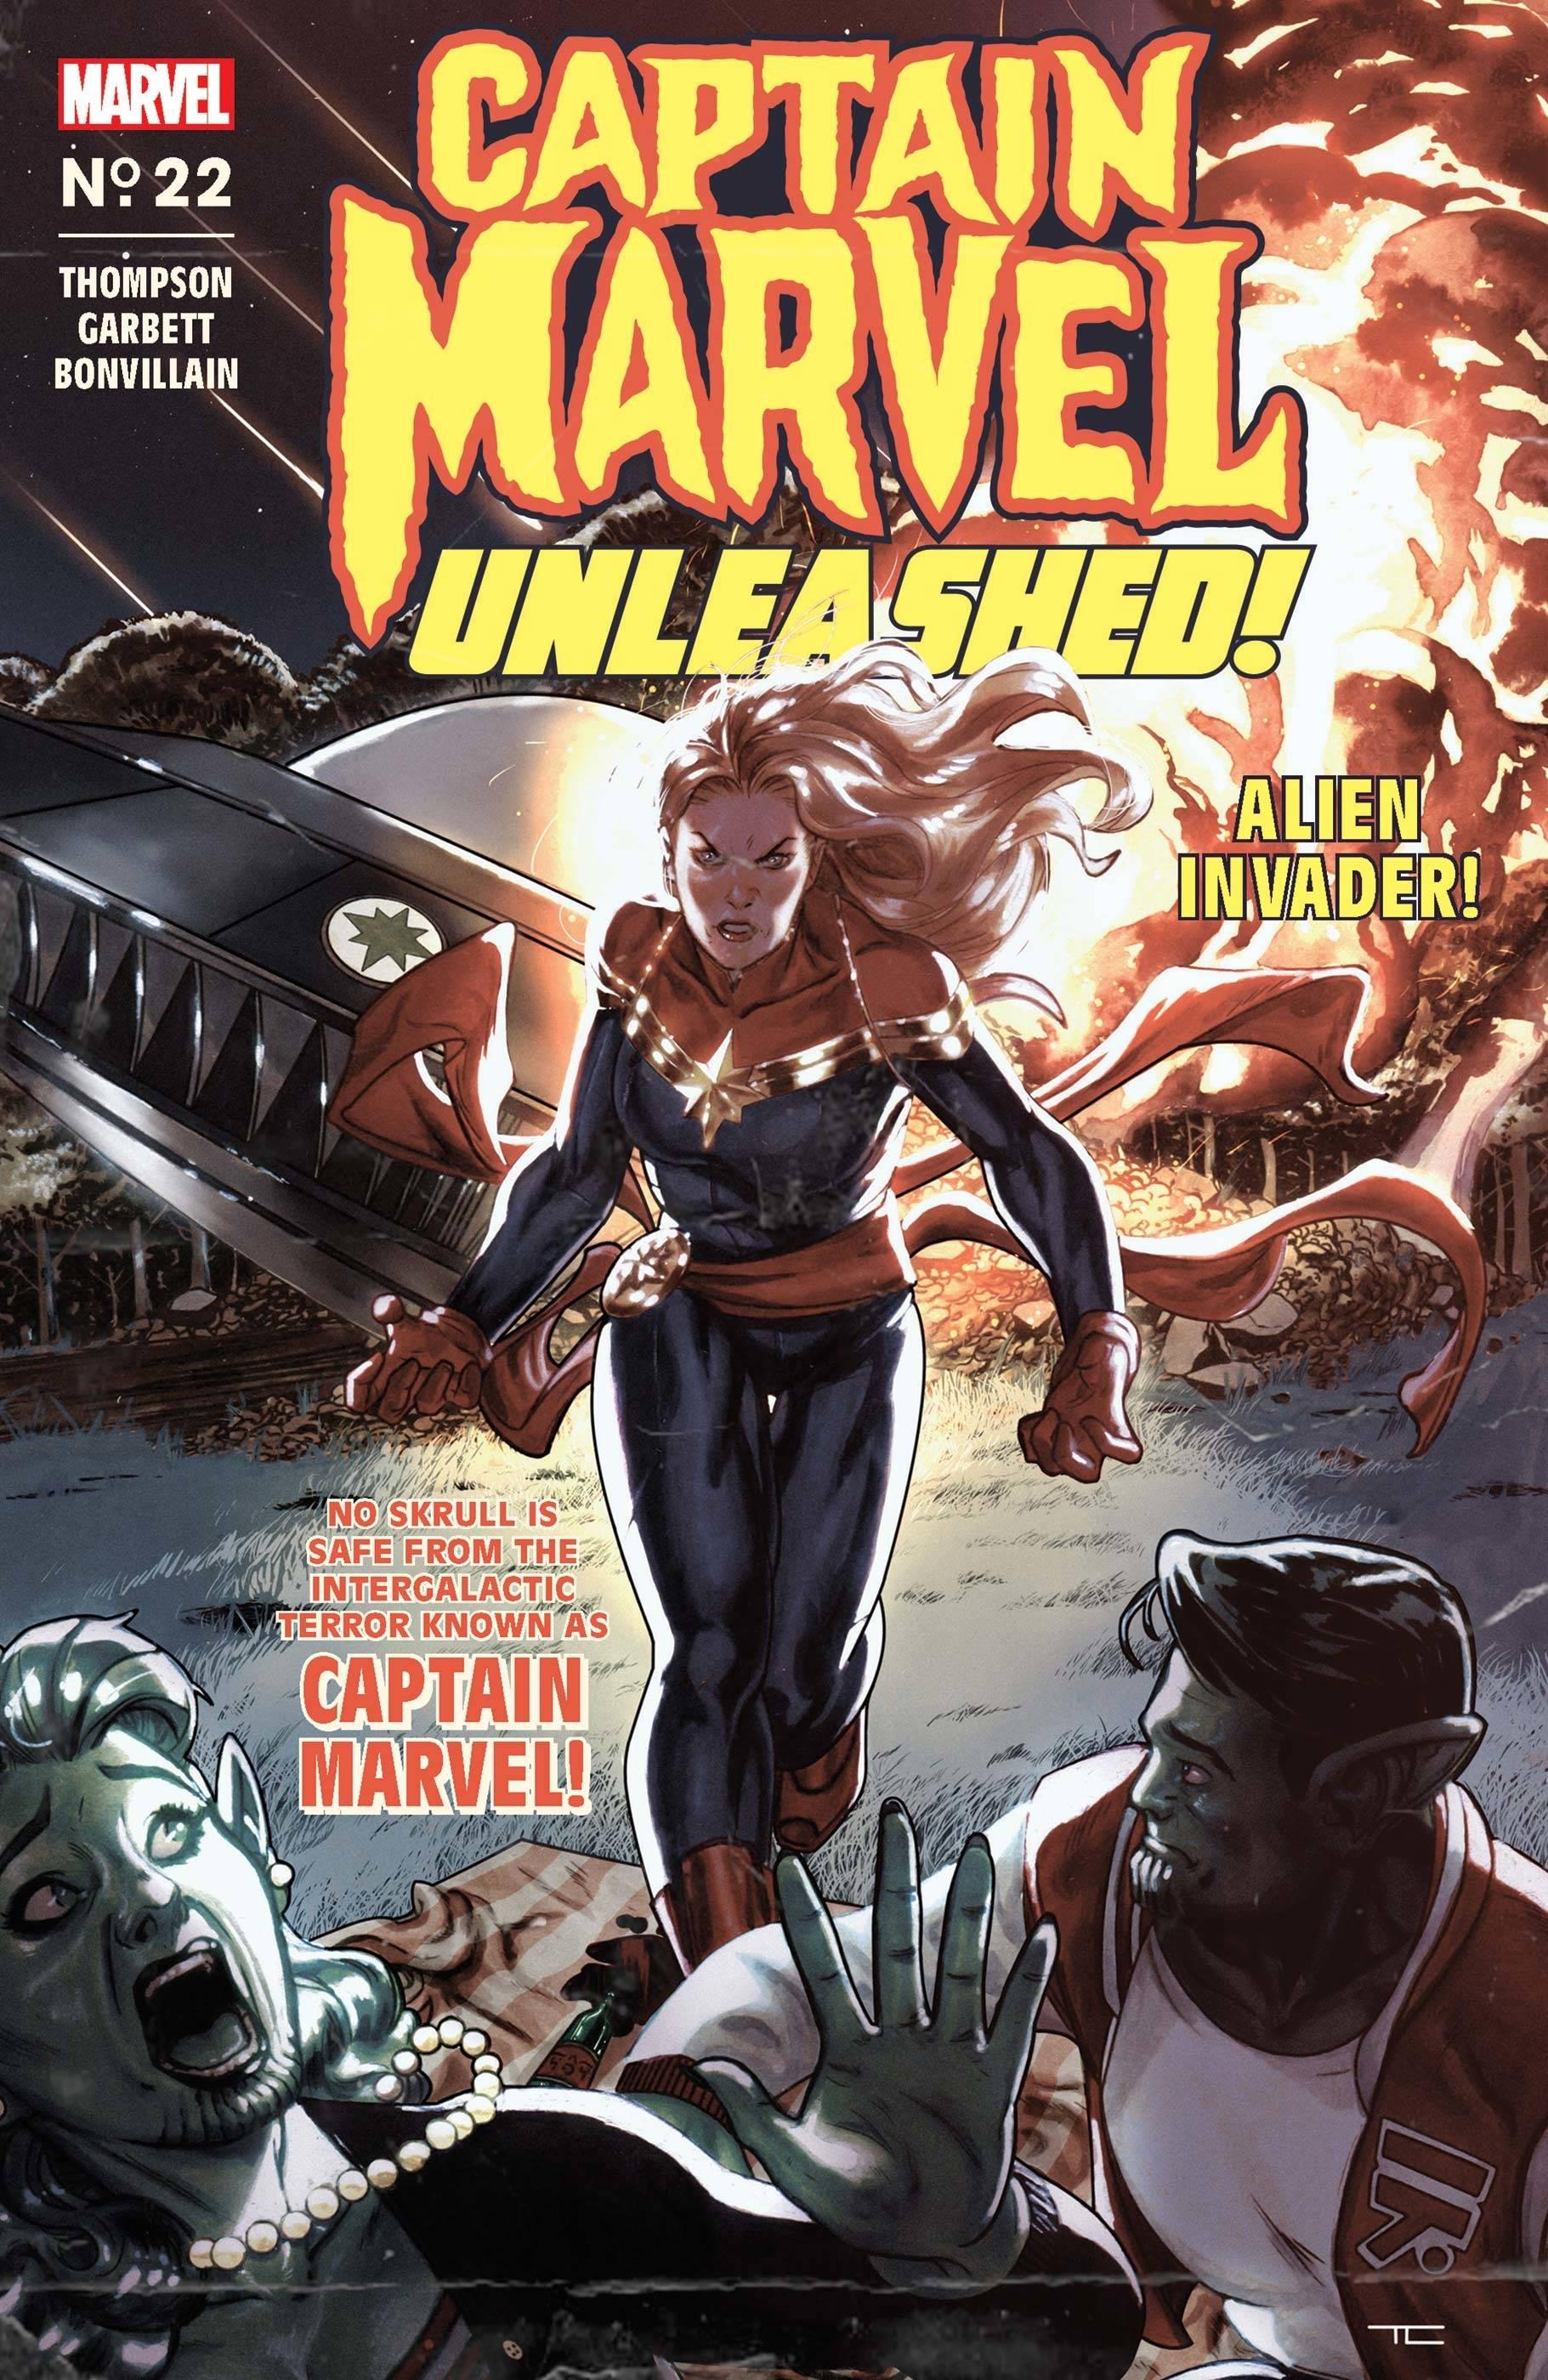 Captain Marvel Vol 10 22 Captain Marvel Unleashed Horror Variant.jpg